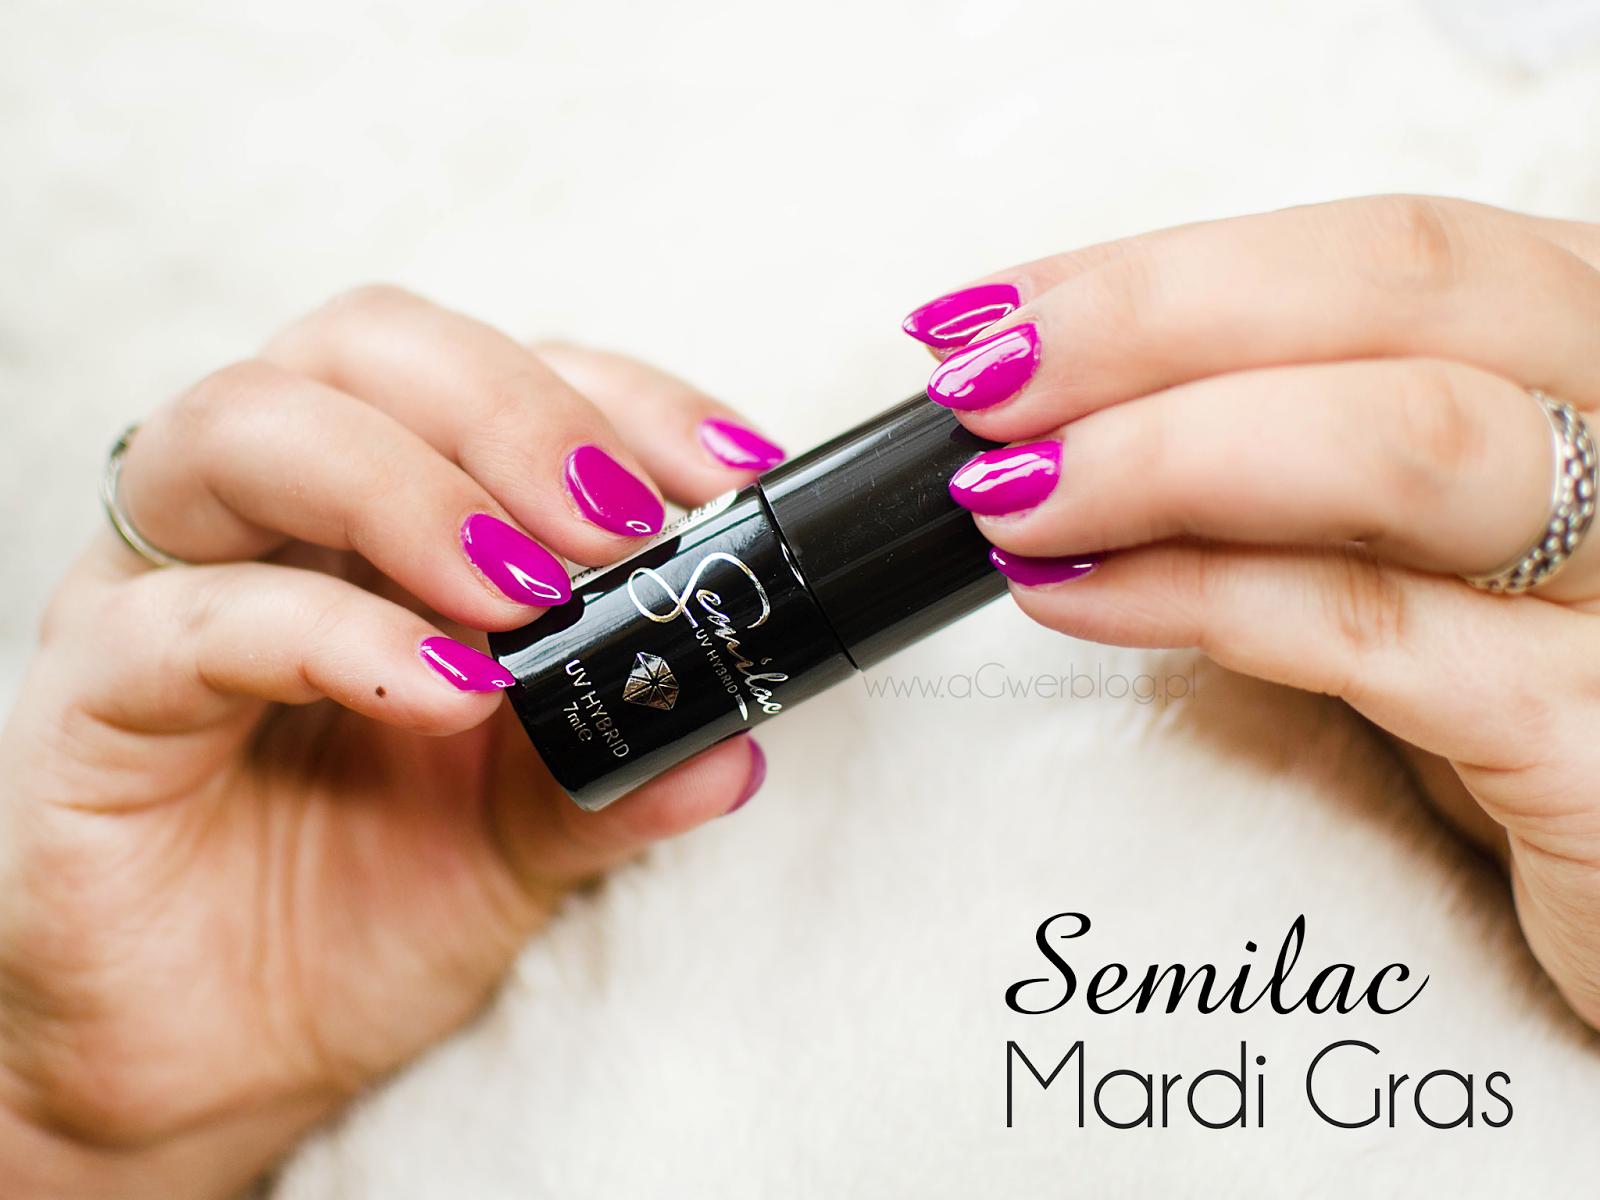 Semilac-Mardi-Gras